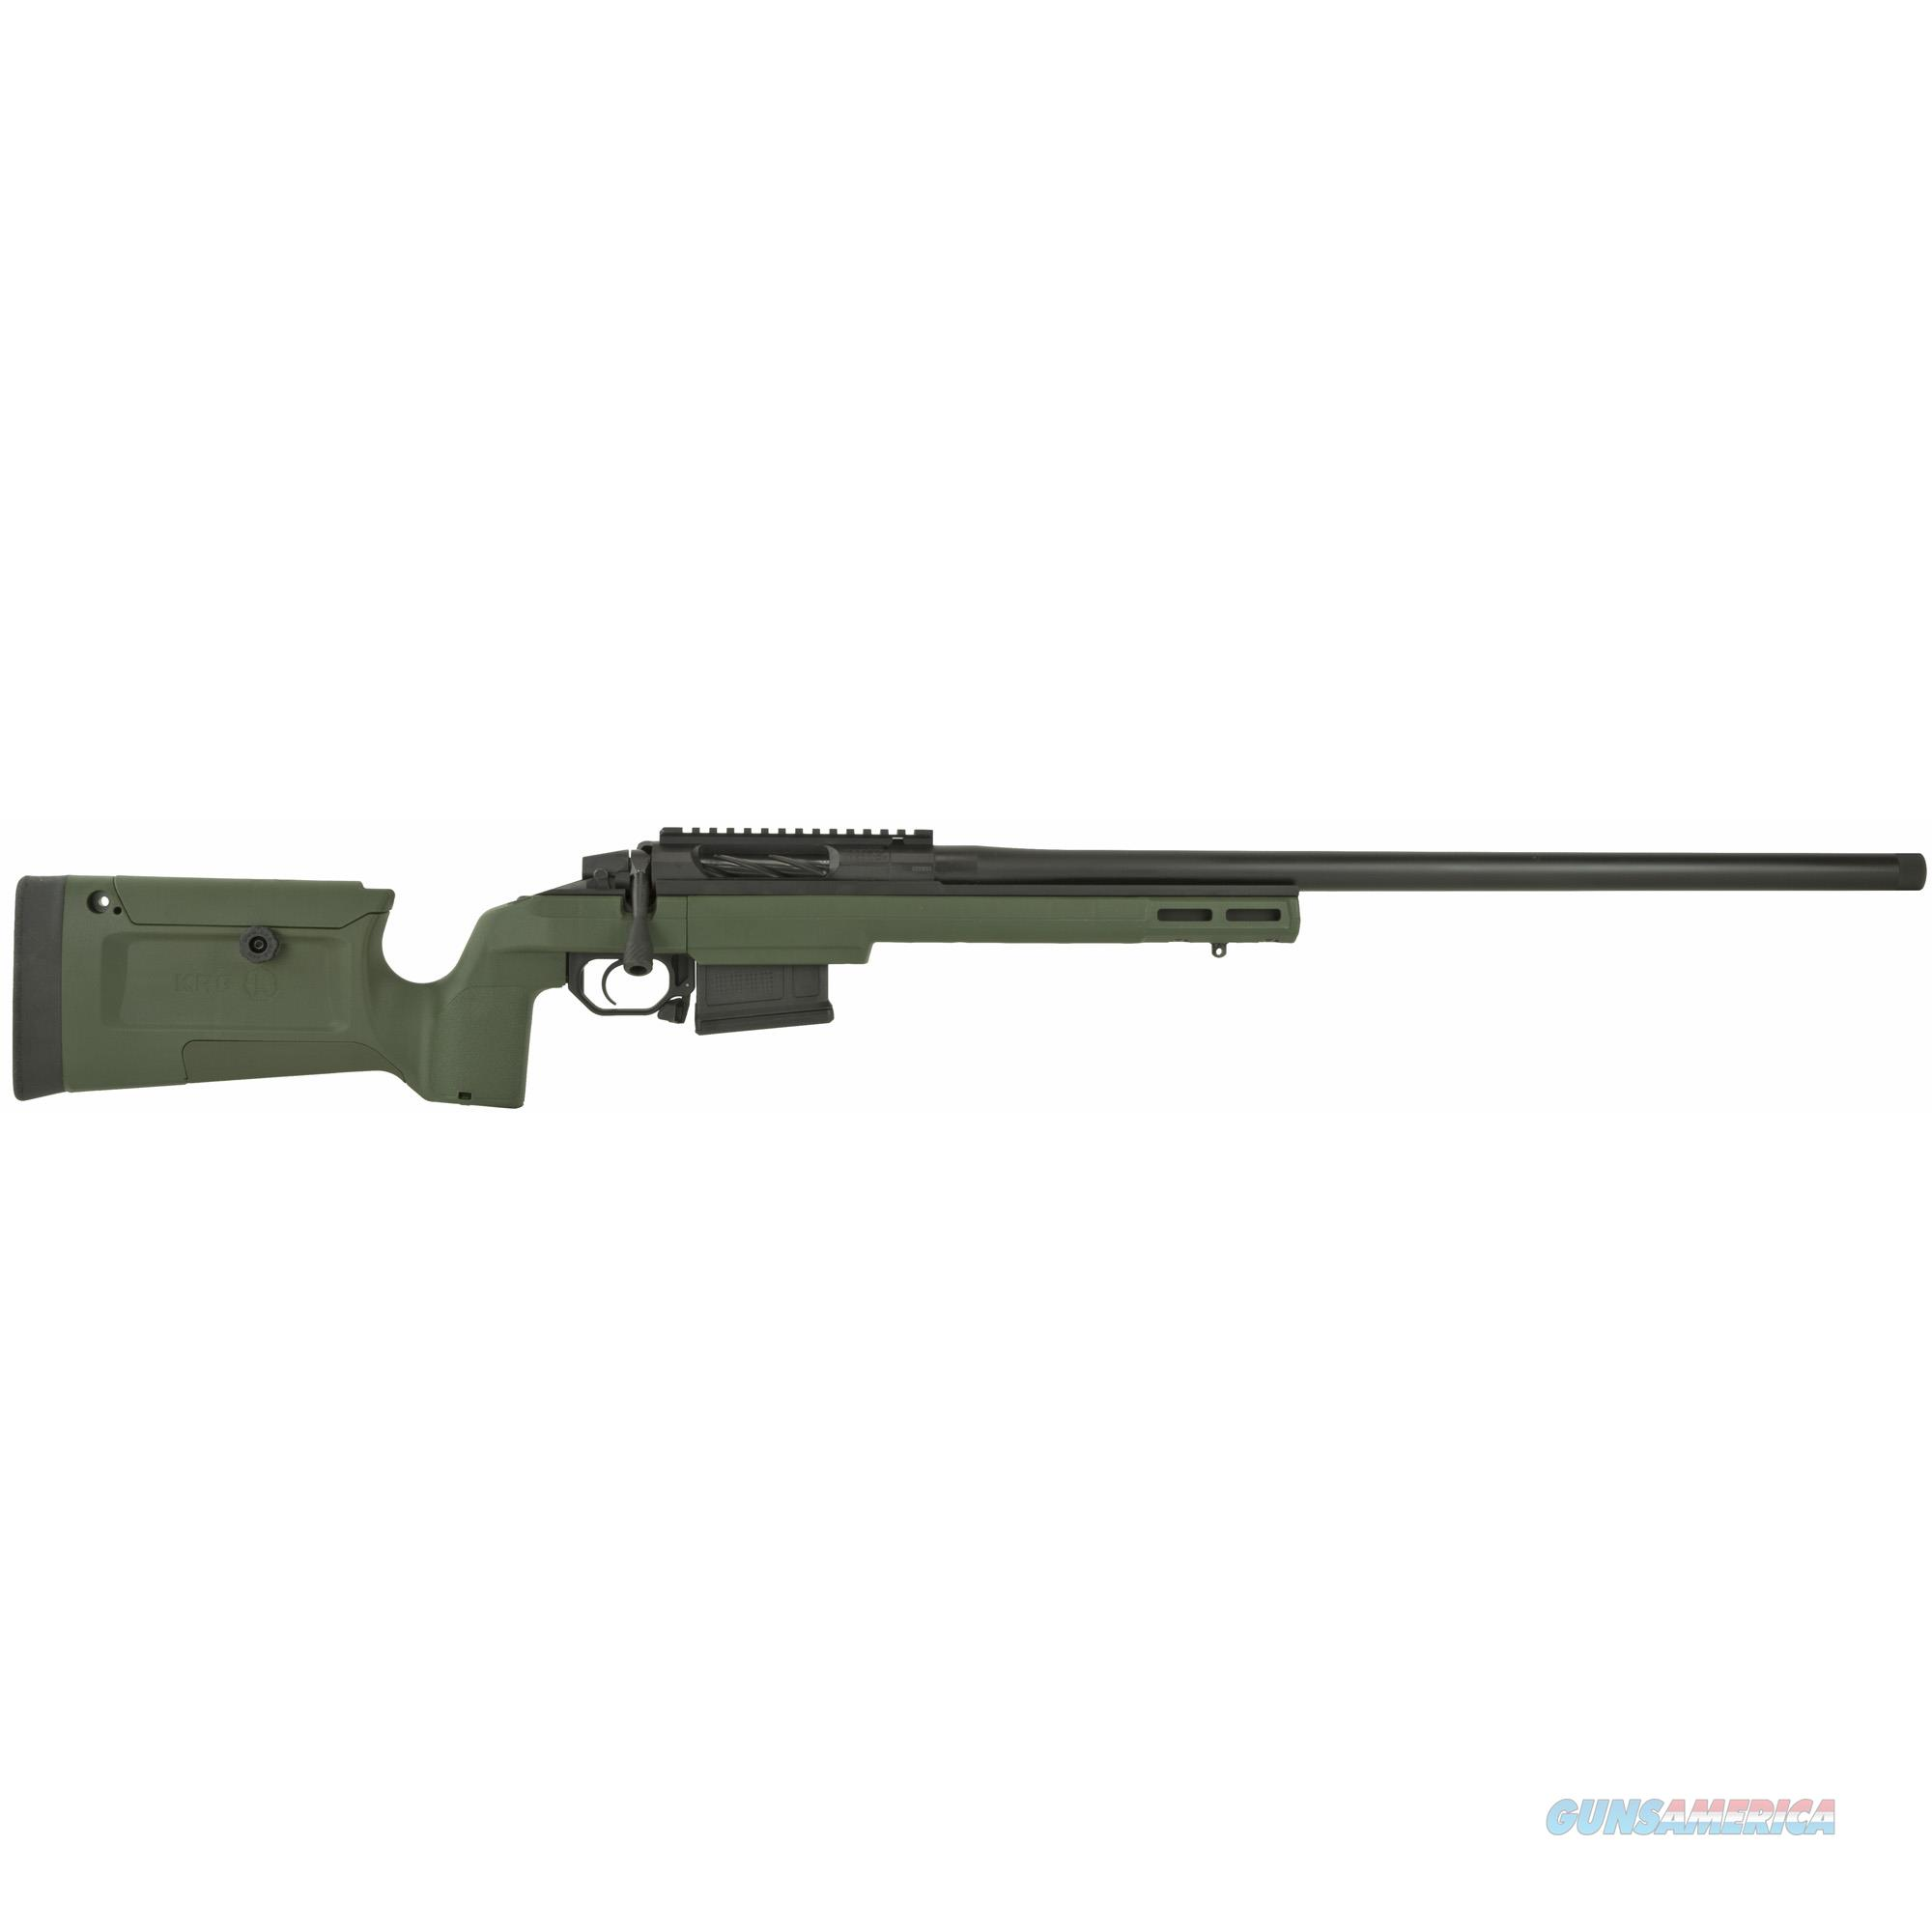 "Seekins Precision Havak Bravo 6mm Creedmoor 24"" Match Threaded Green KRG Chassis Long Range Precision *NEW*  Guns > Rifles > S Misc Rifles"